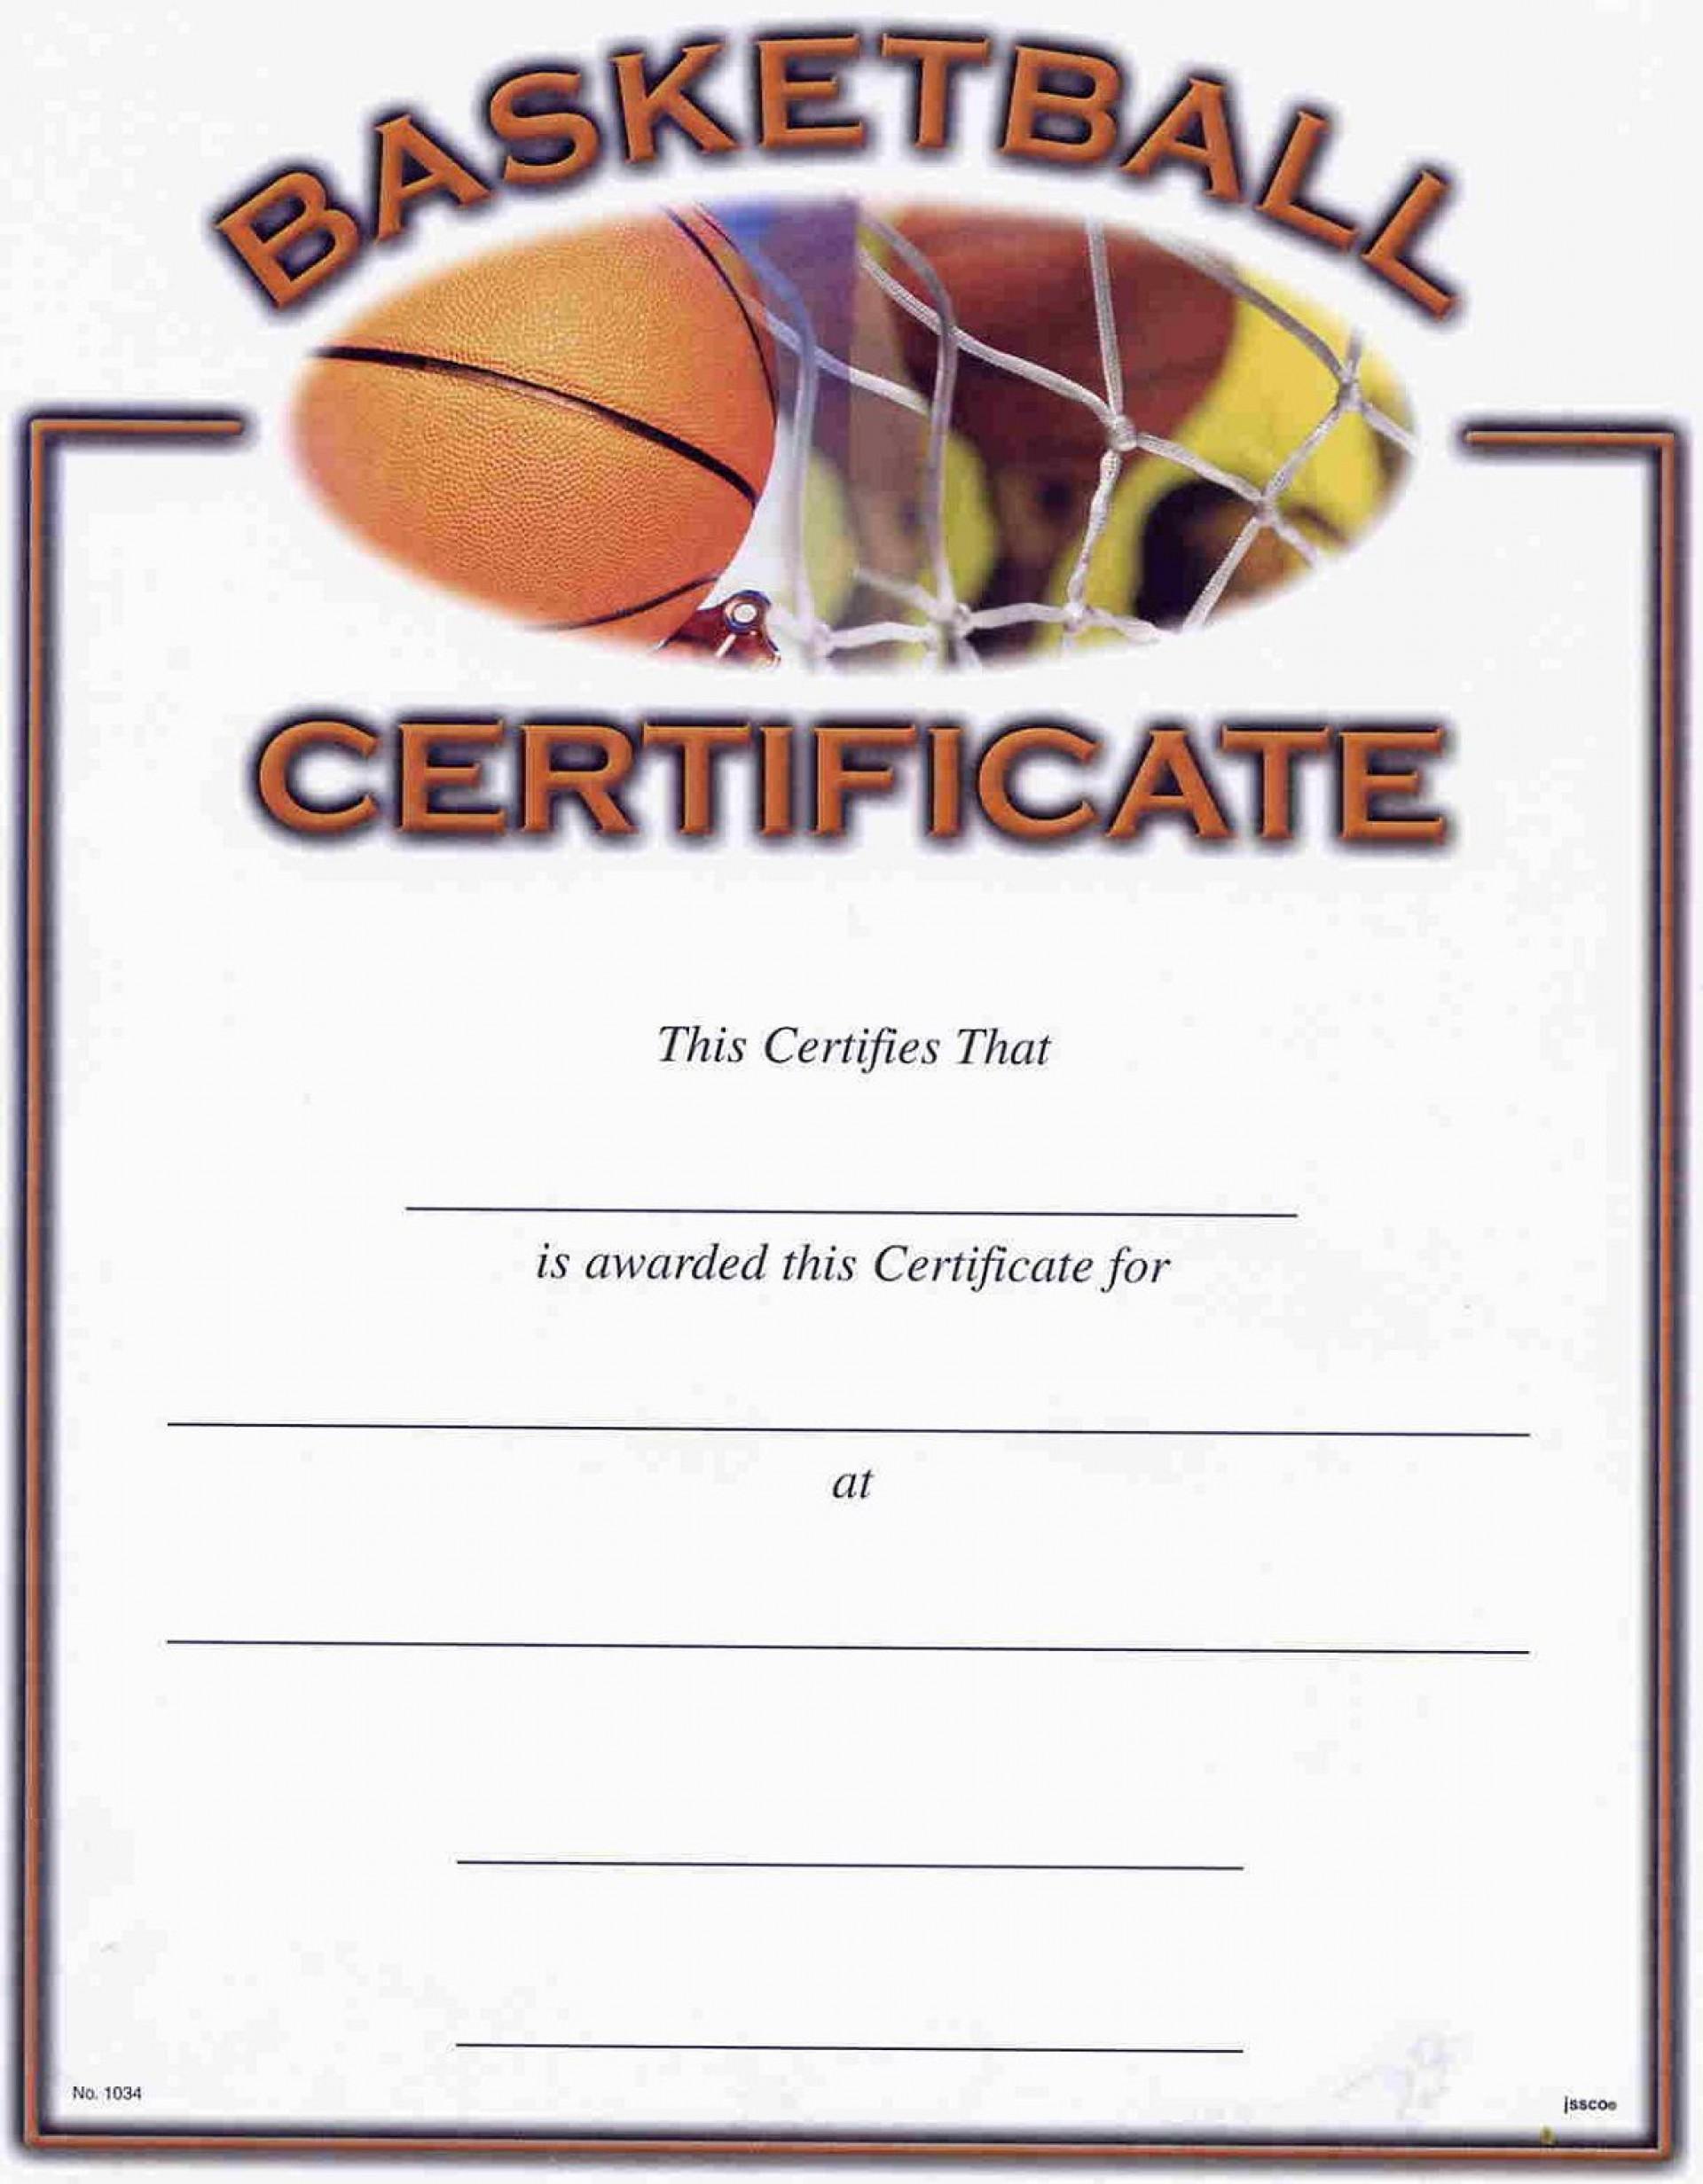 006 Surprising Free Printable Basketball Certificate Template Inspiration  Templates1920